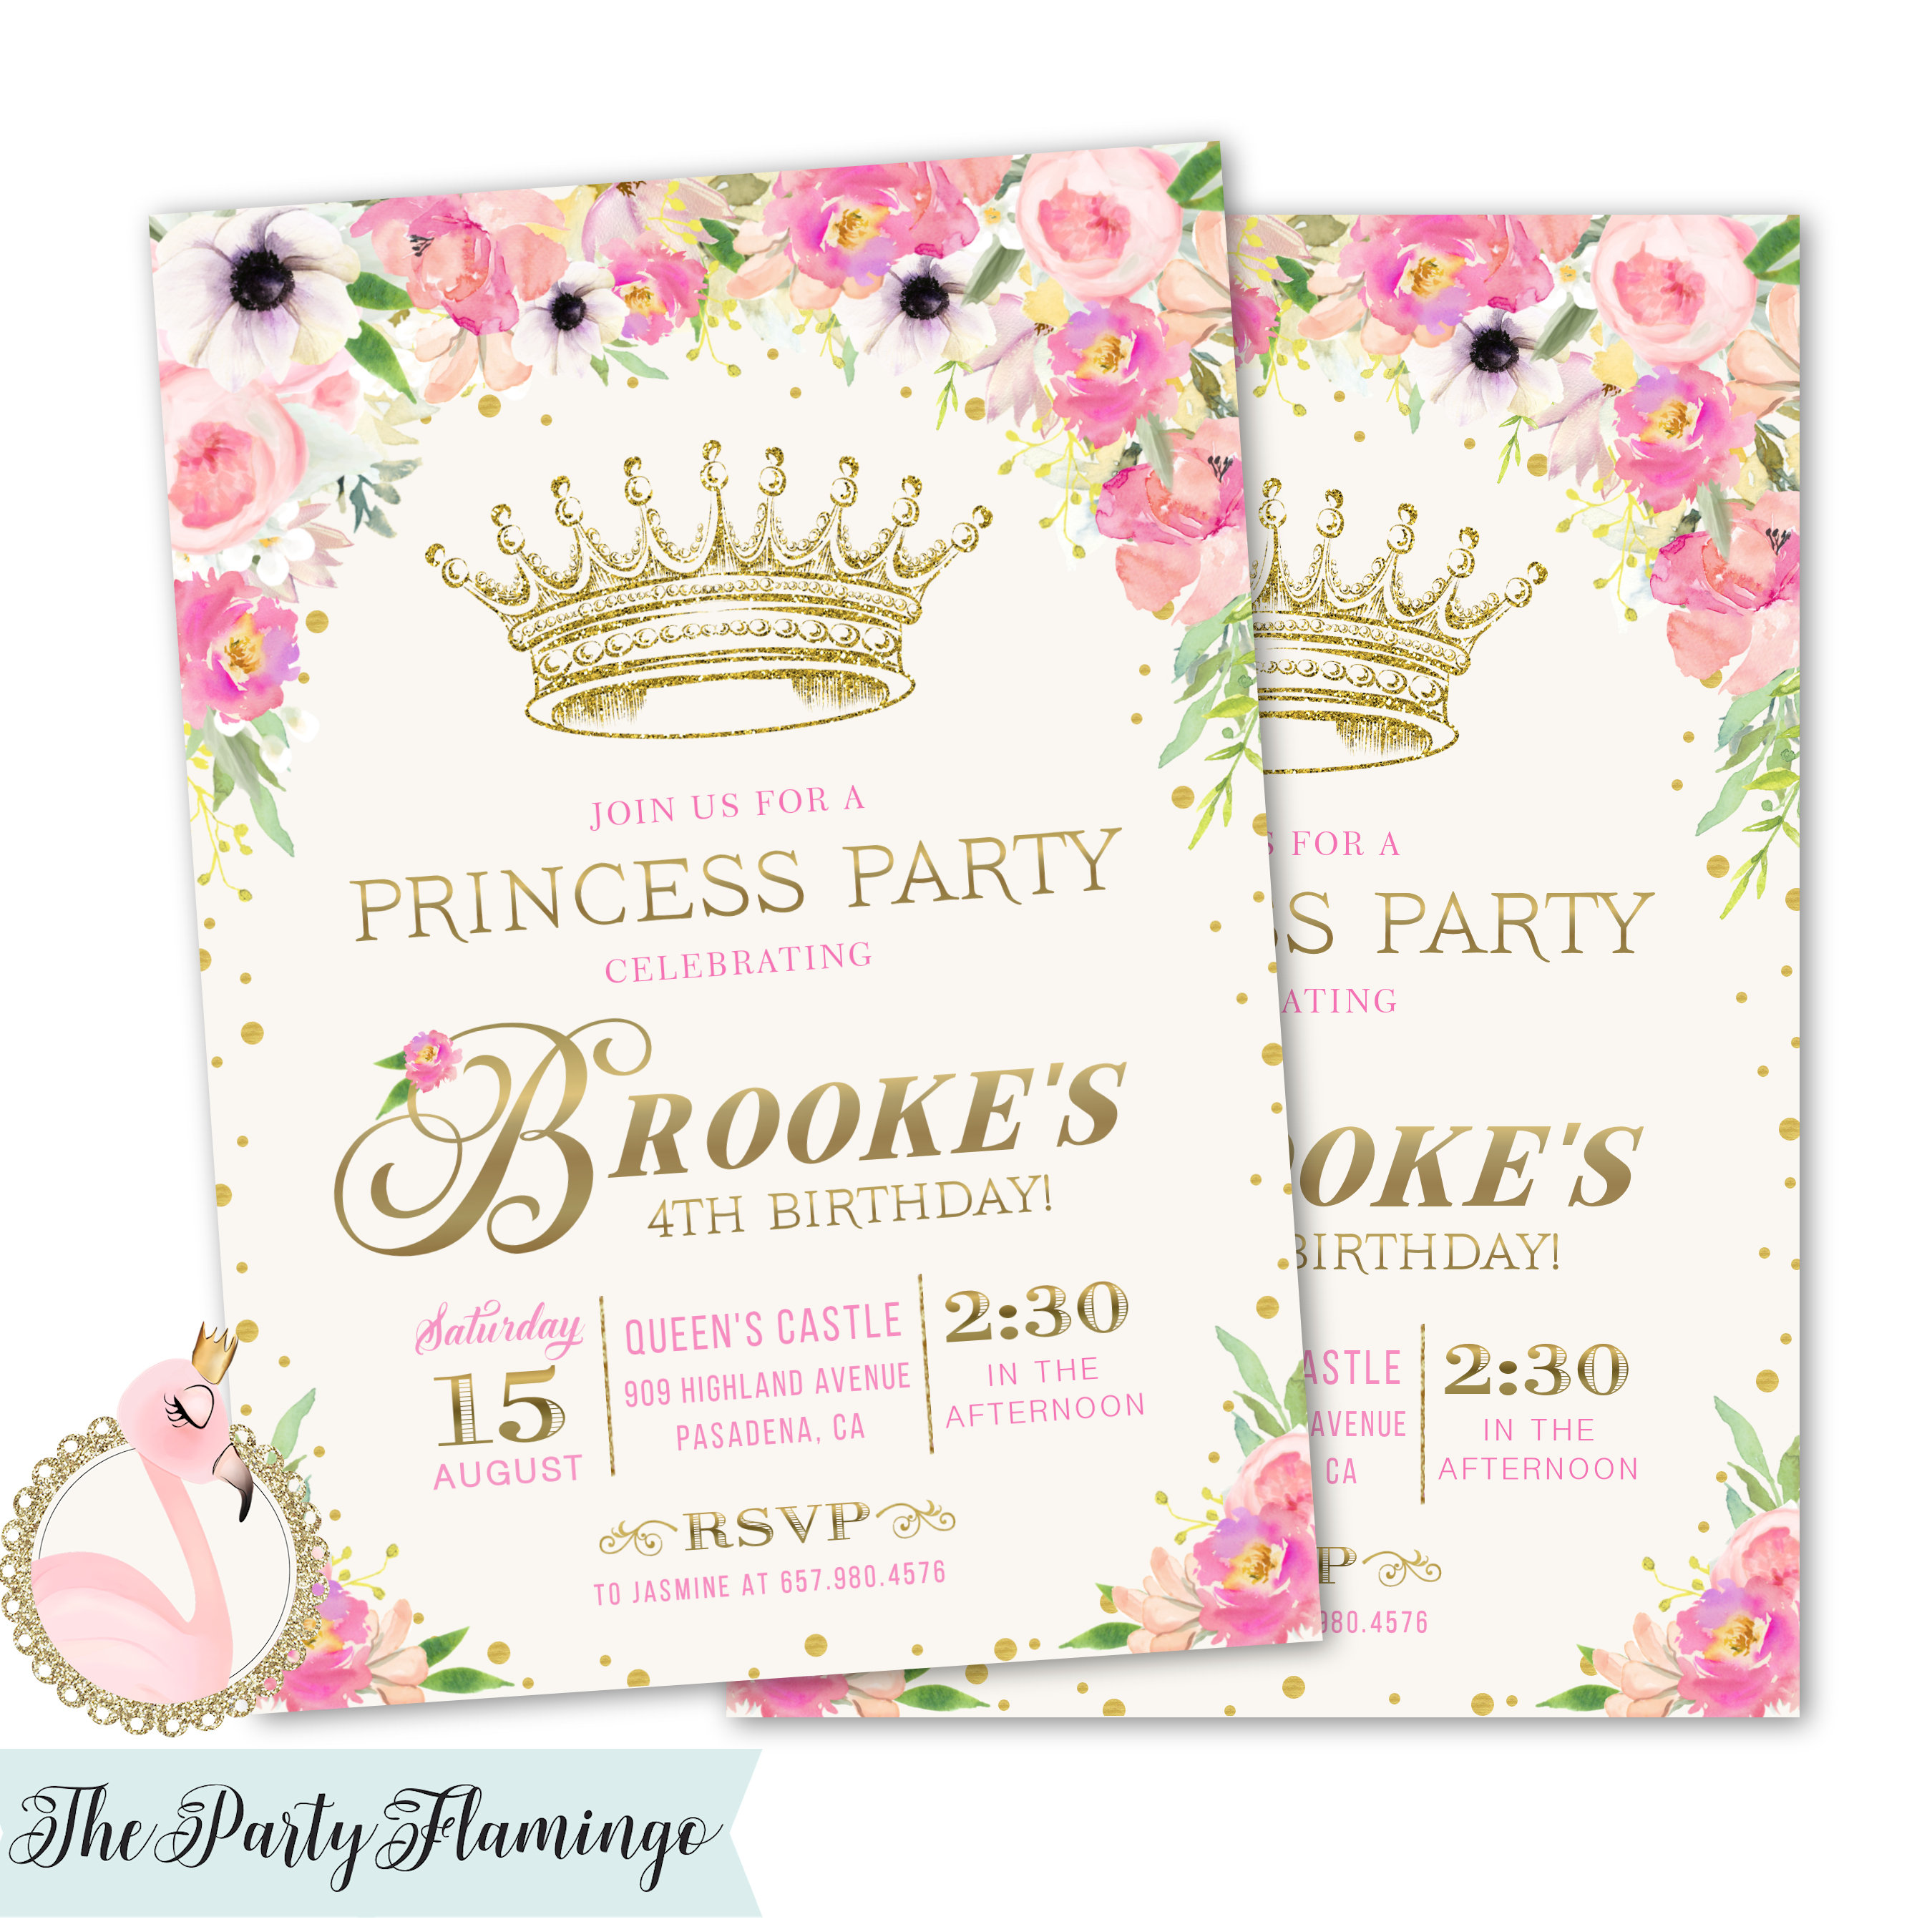 Princess Party Invitations Princess Birthday Party Invites Etsy